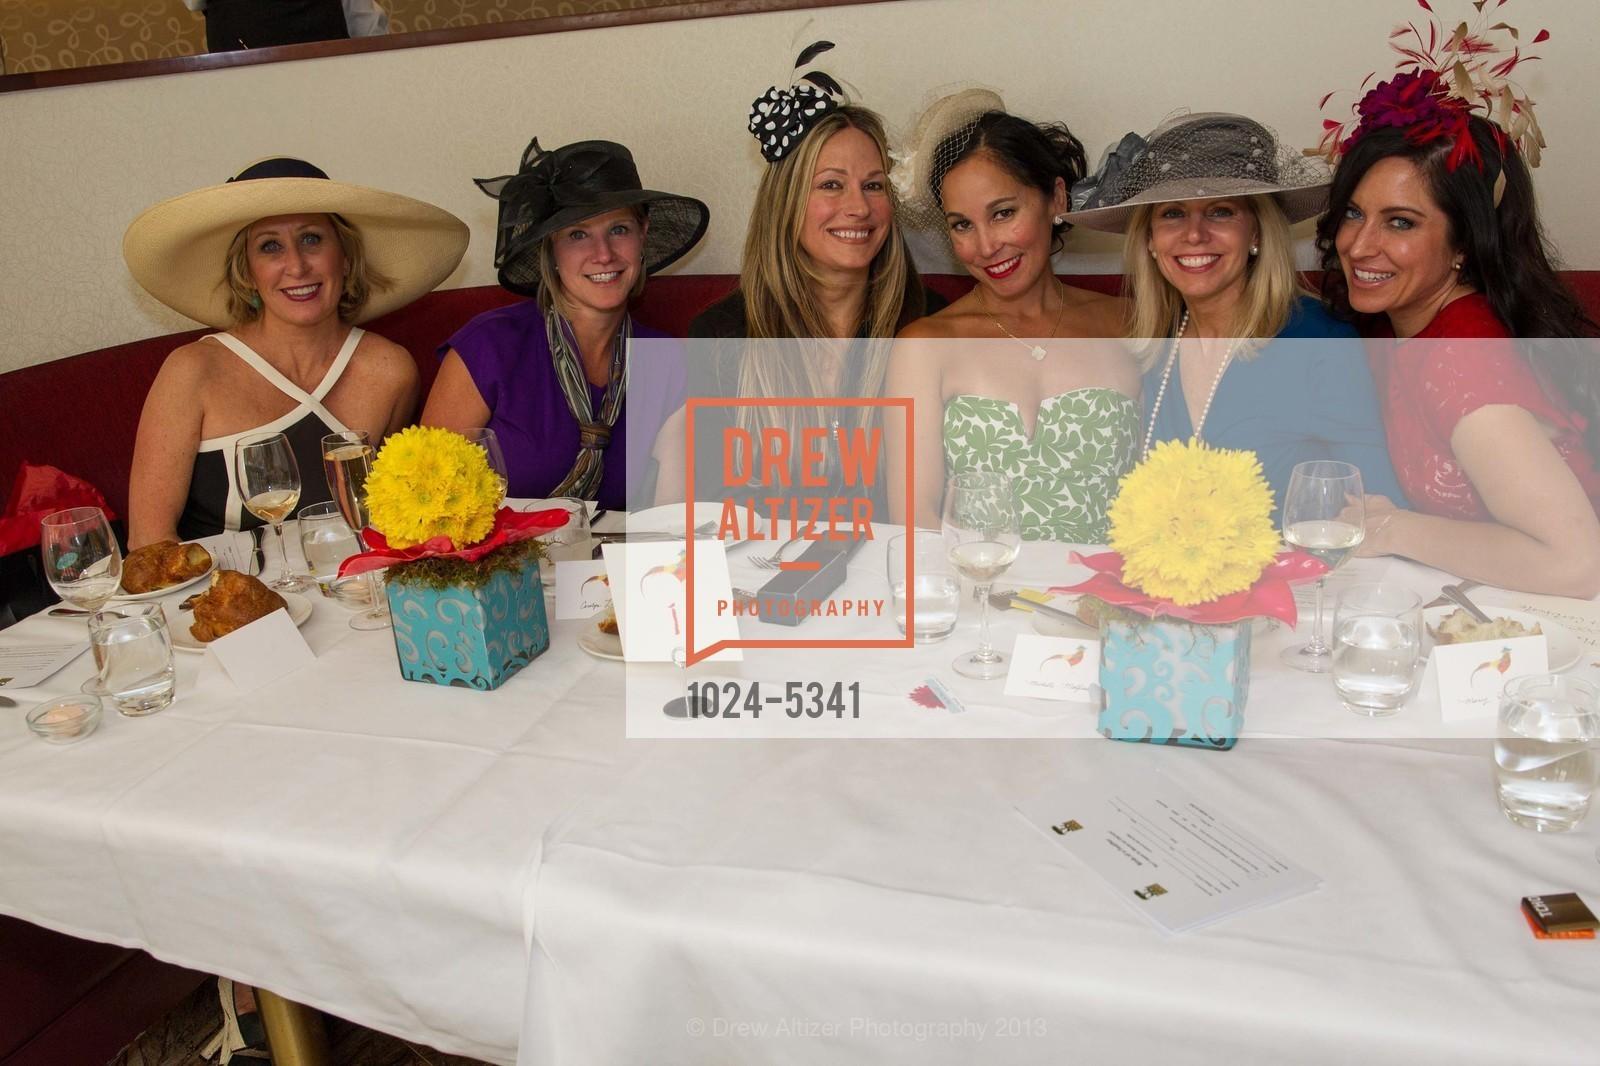 Lisa Keith, Carol Ann Weiss, Carolyne Zinko, Michelle Molfino, Corey Hyde, Photo #1024-5341